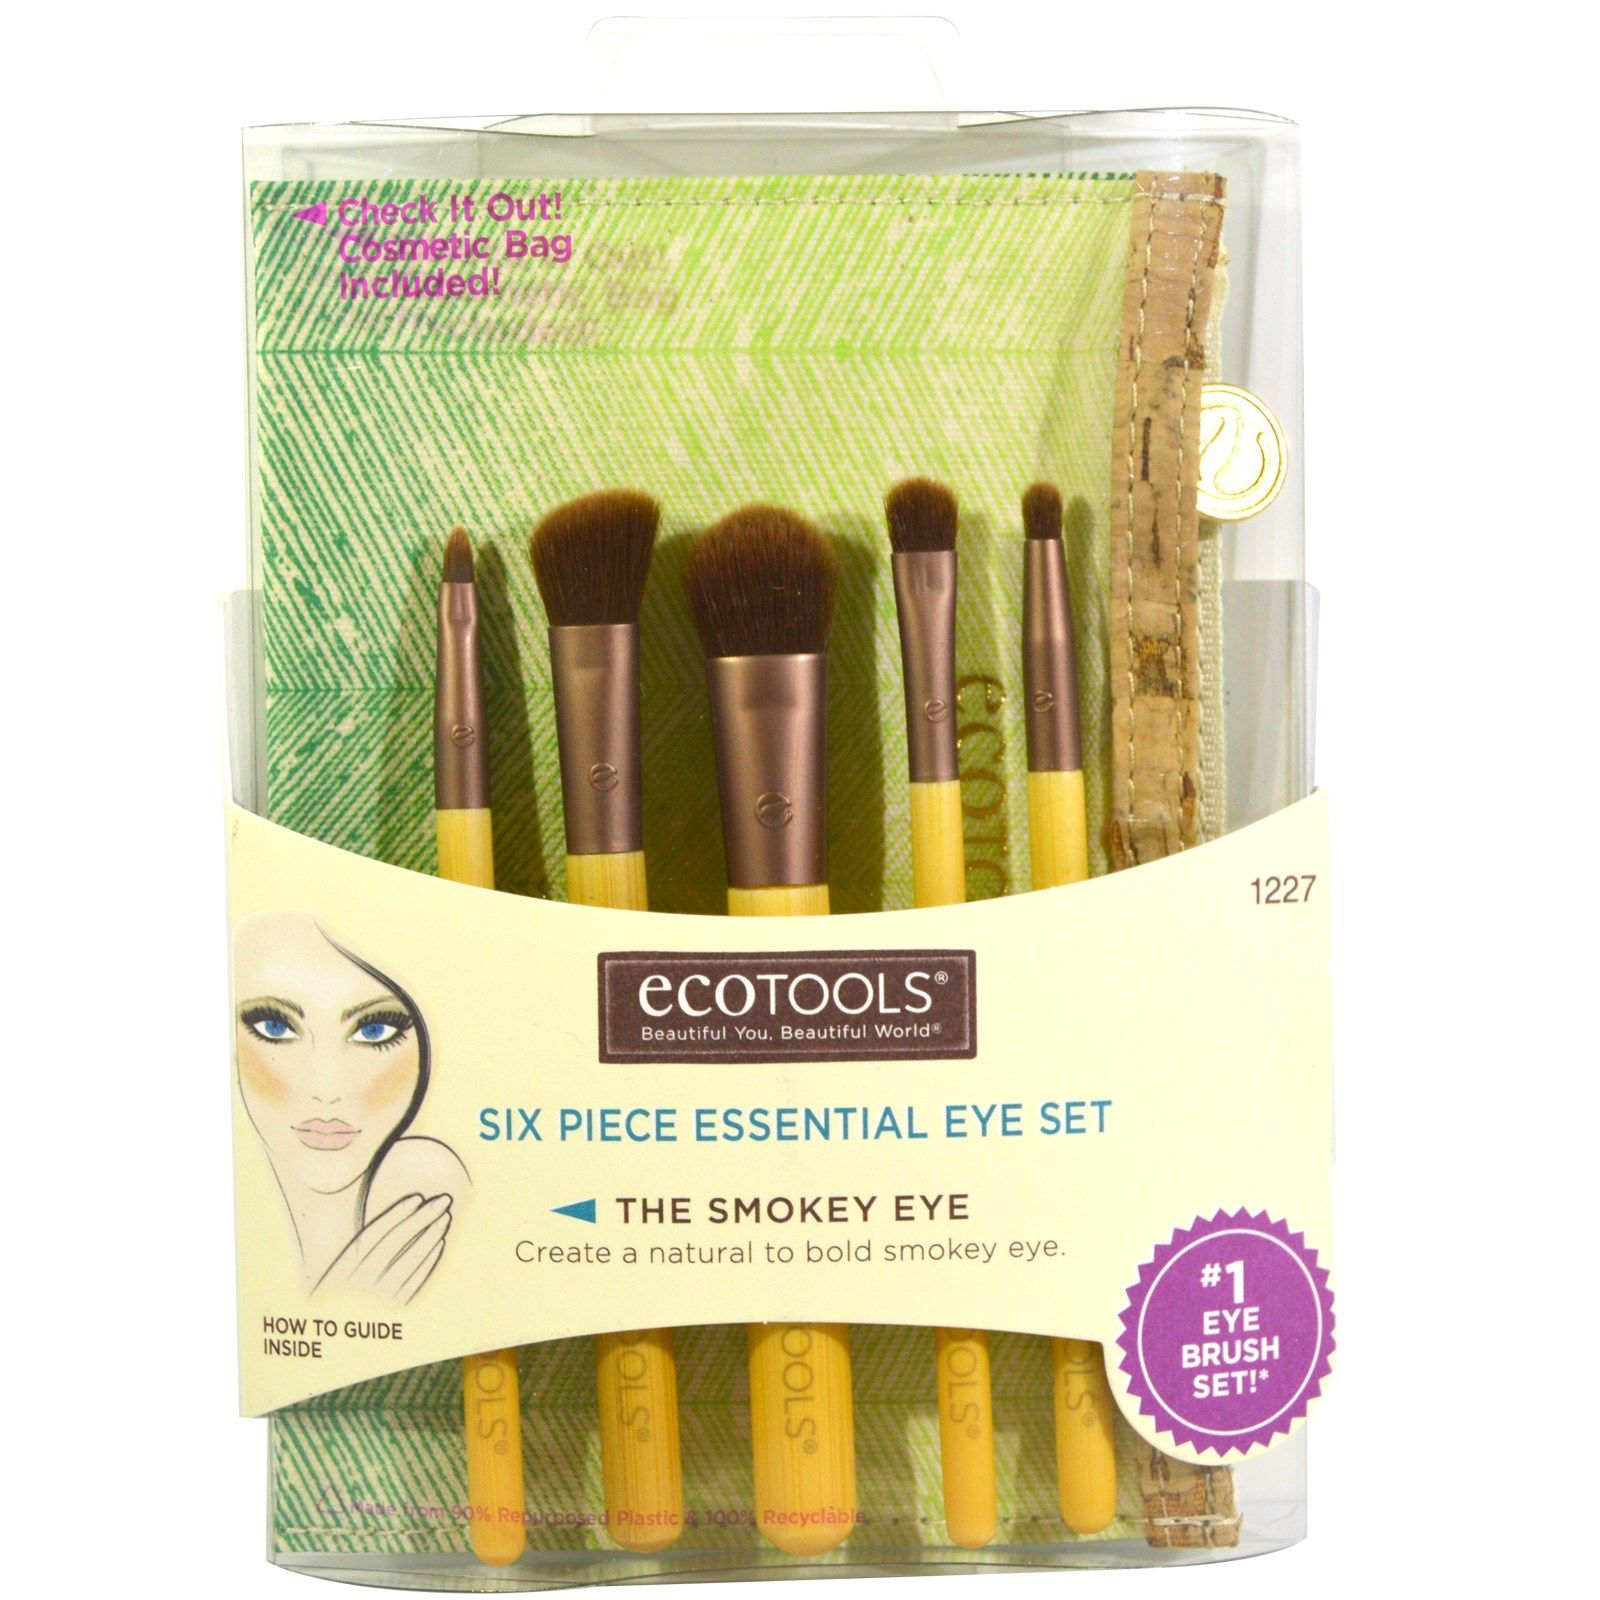 EcoTools, Six Piece Essential Eye Set, 5 Brushes, 1 Travel